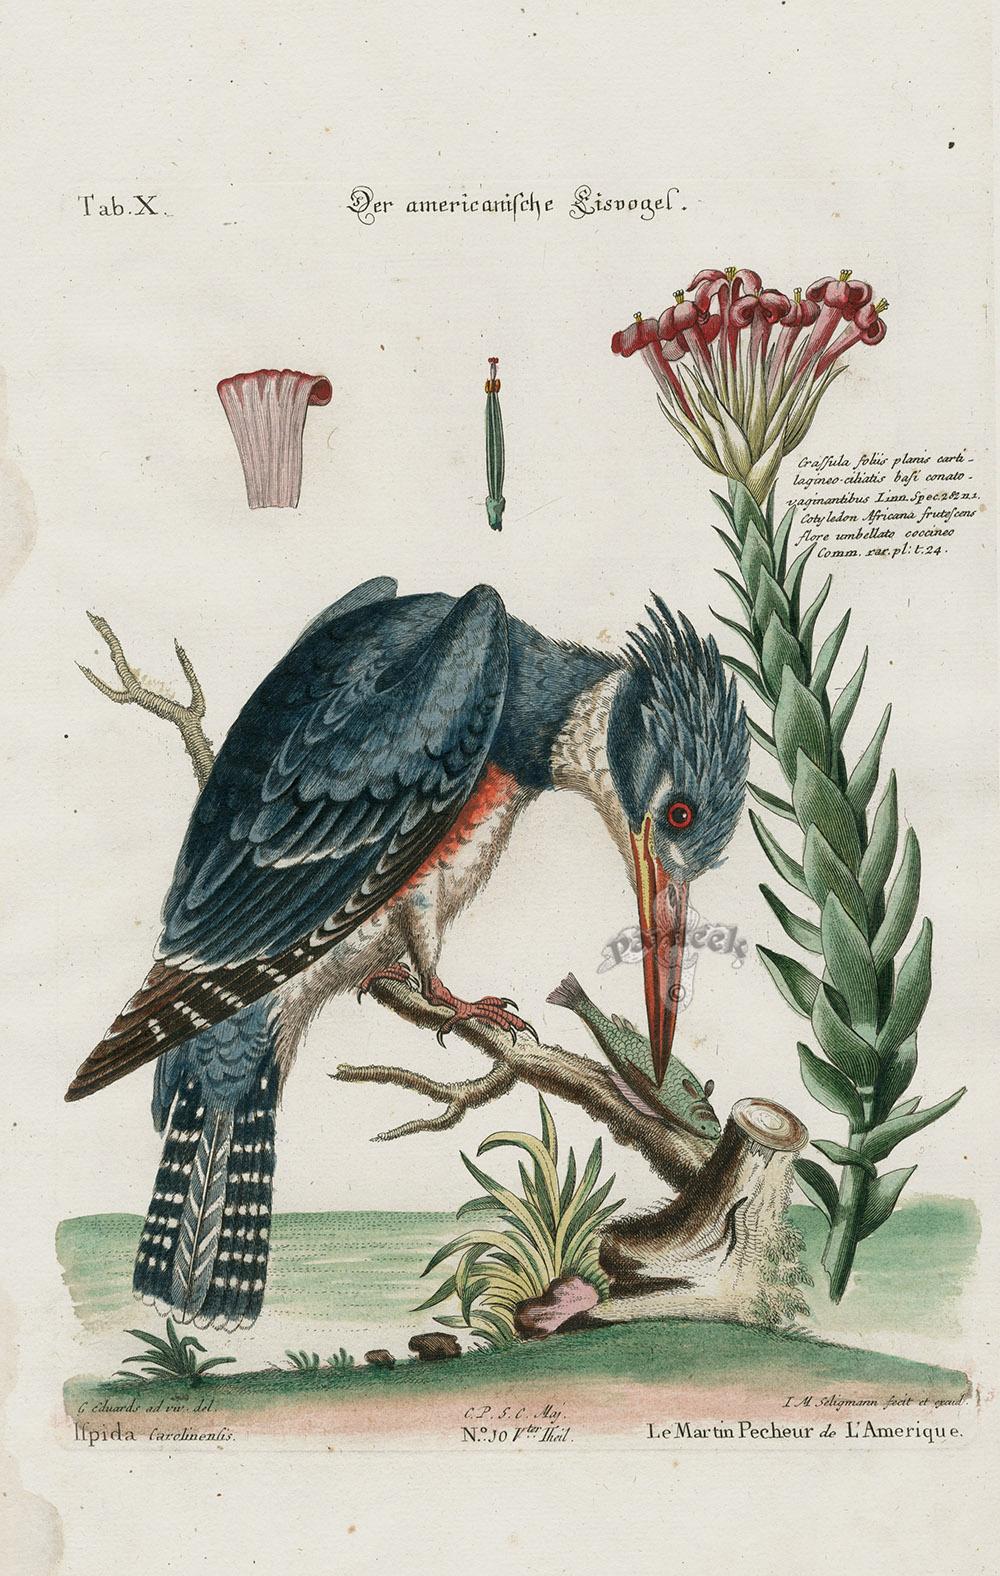 Kingfisher  Ispida Carolinensis  Crassula Foliis Planis